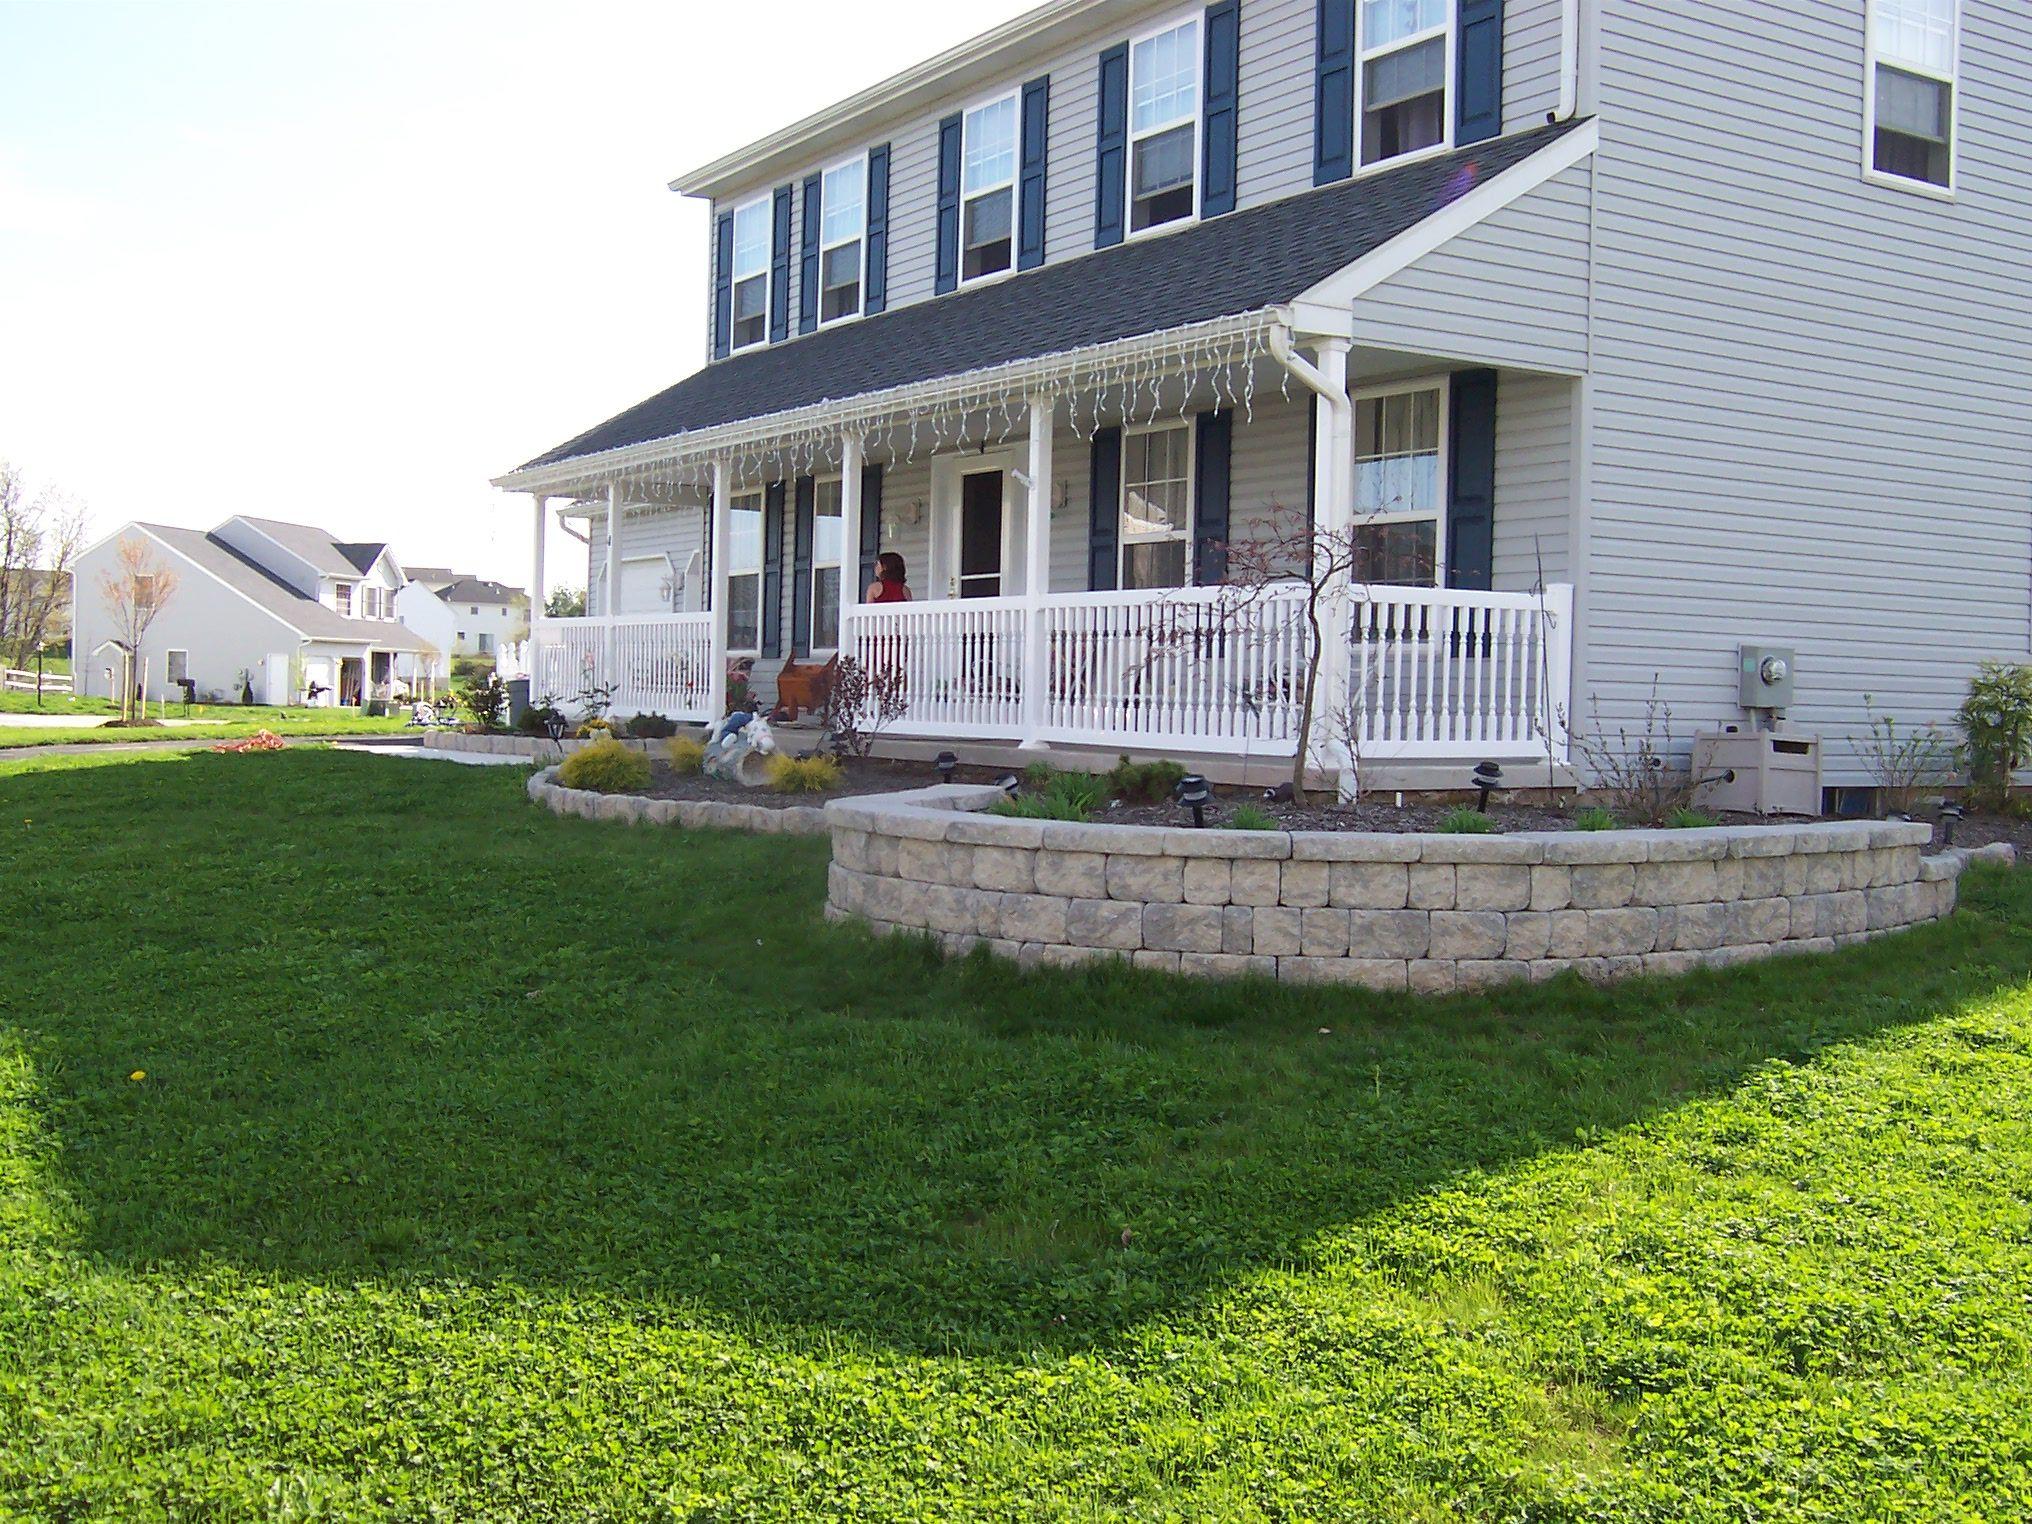 retaining wall Backyard remodel, Front yard landscaping